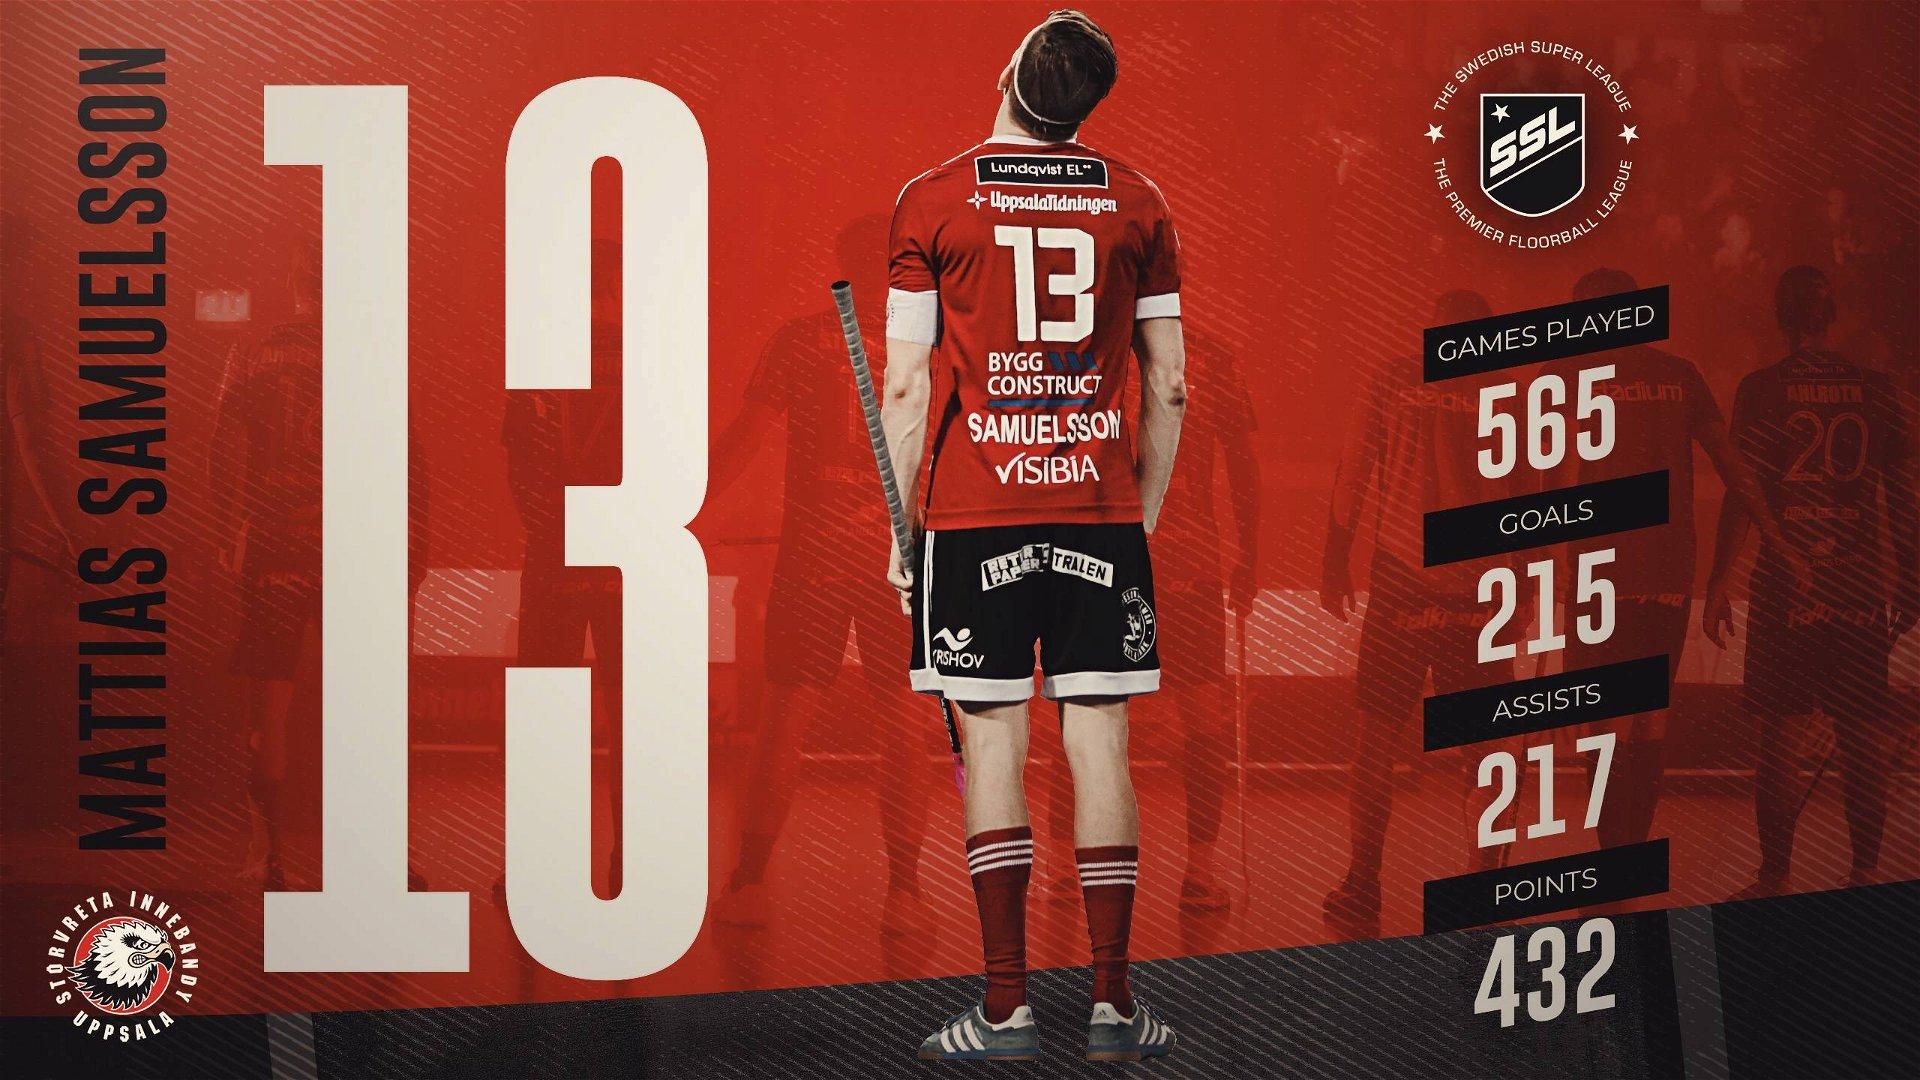 Goals by Mattias Samuelsson